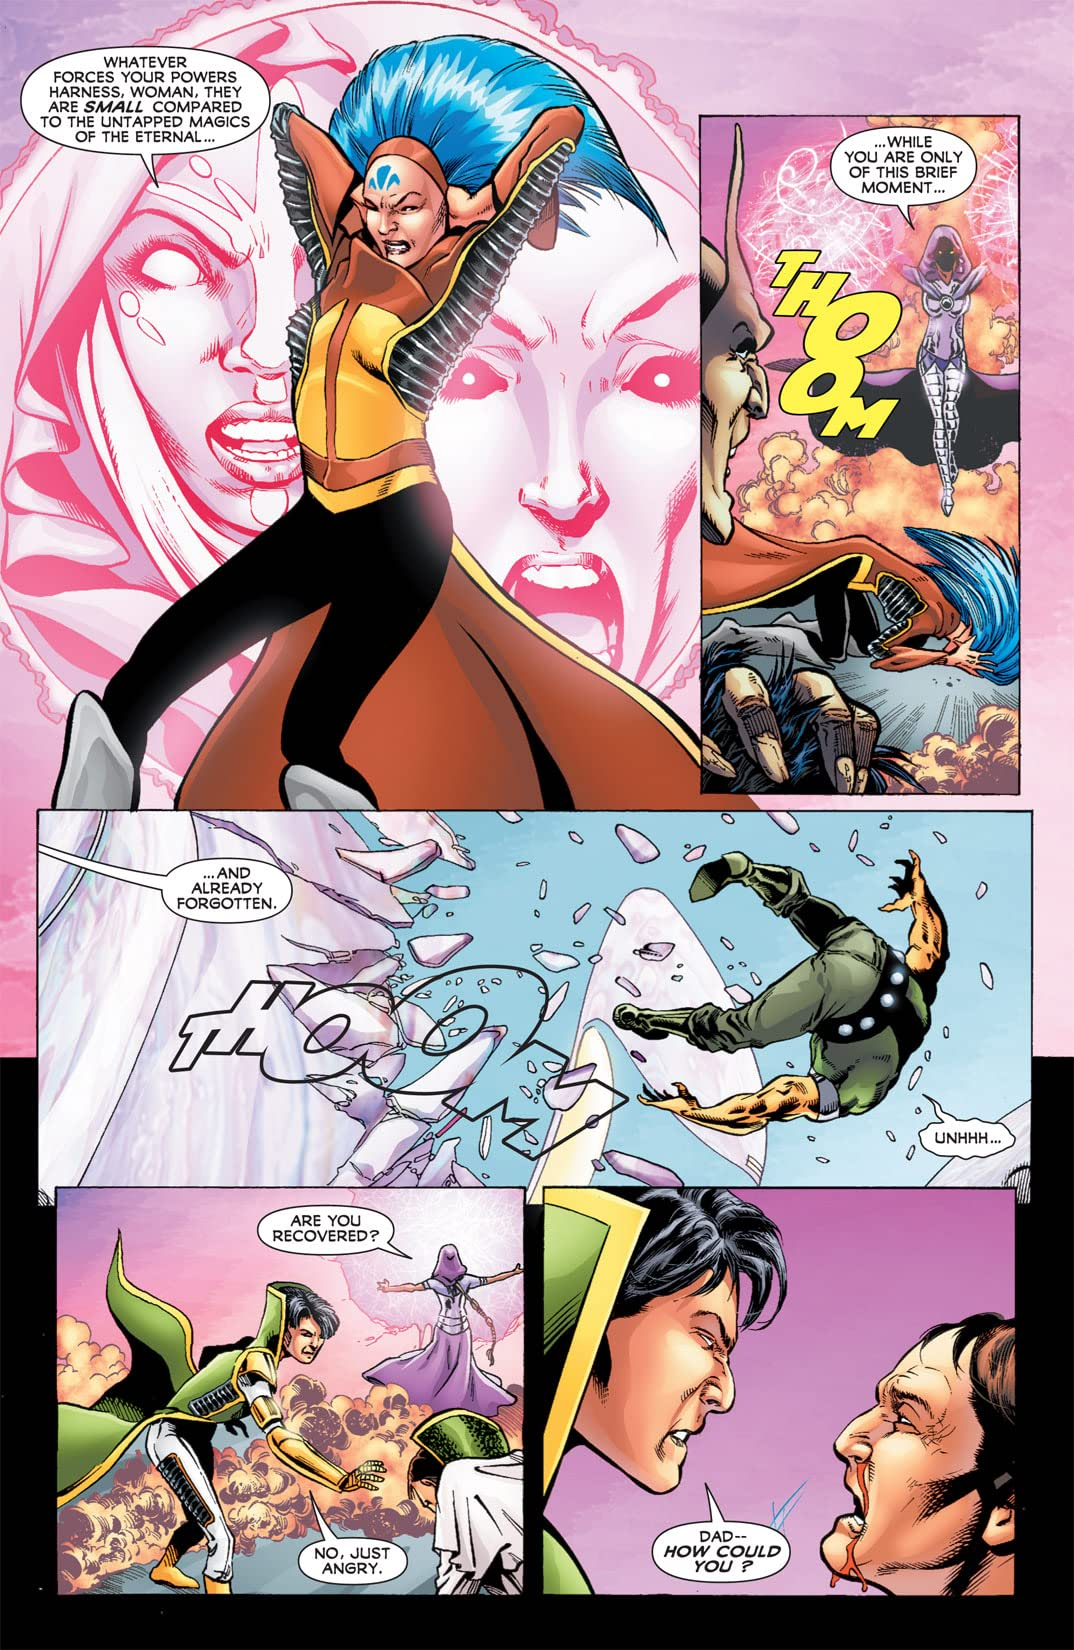 Adventure Comics (2009-2011) #525